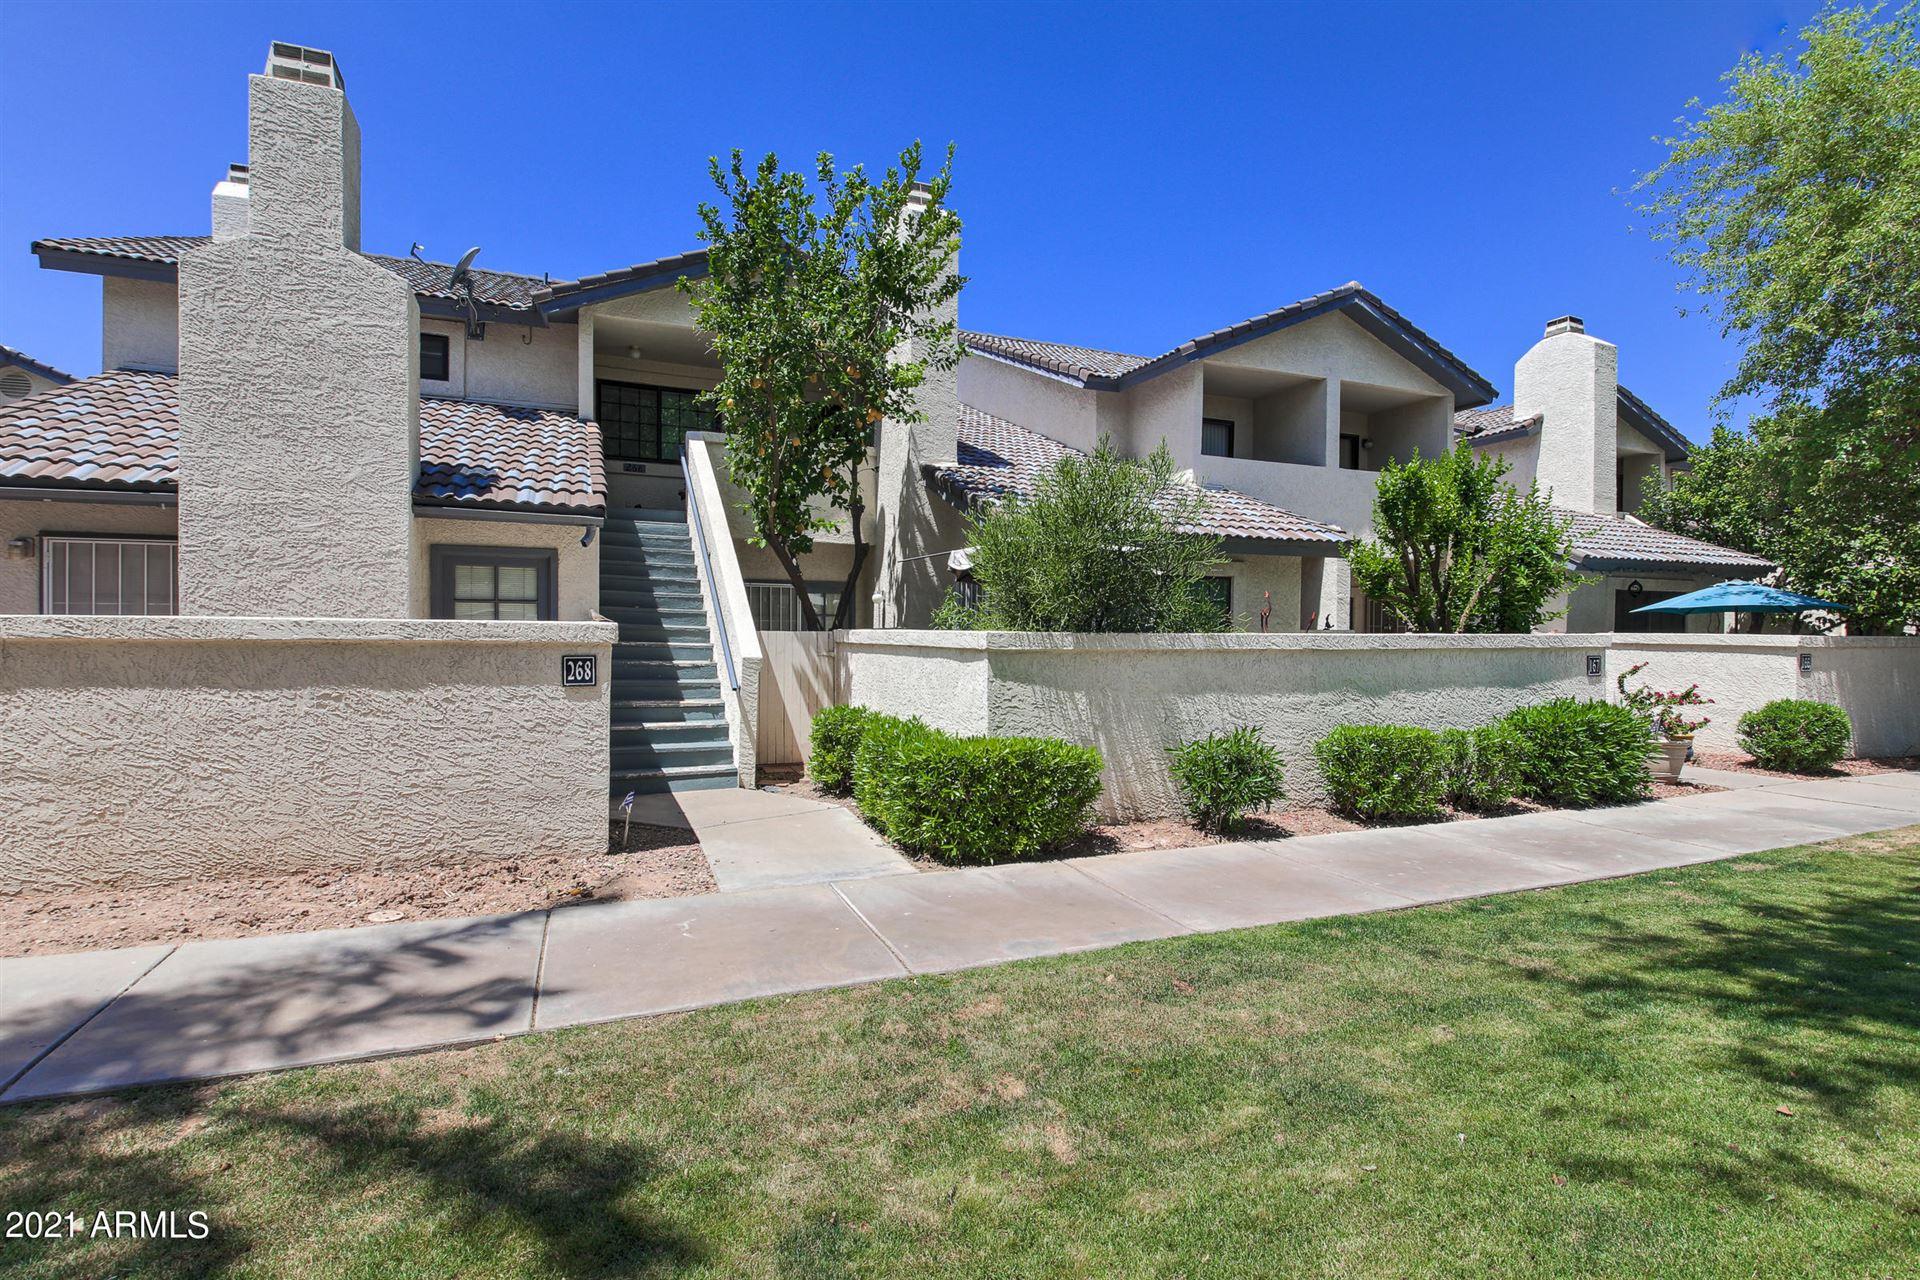 Photo of 1222 W BASELINE Road #268, Tempe, AZ 85283 (MLS # 6230361)